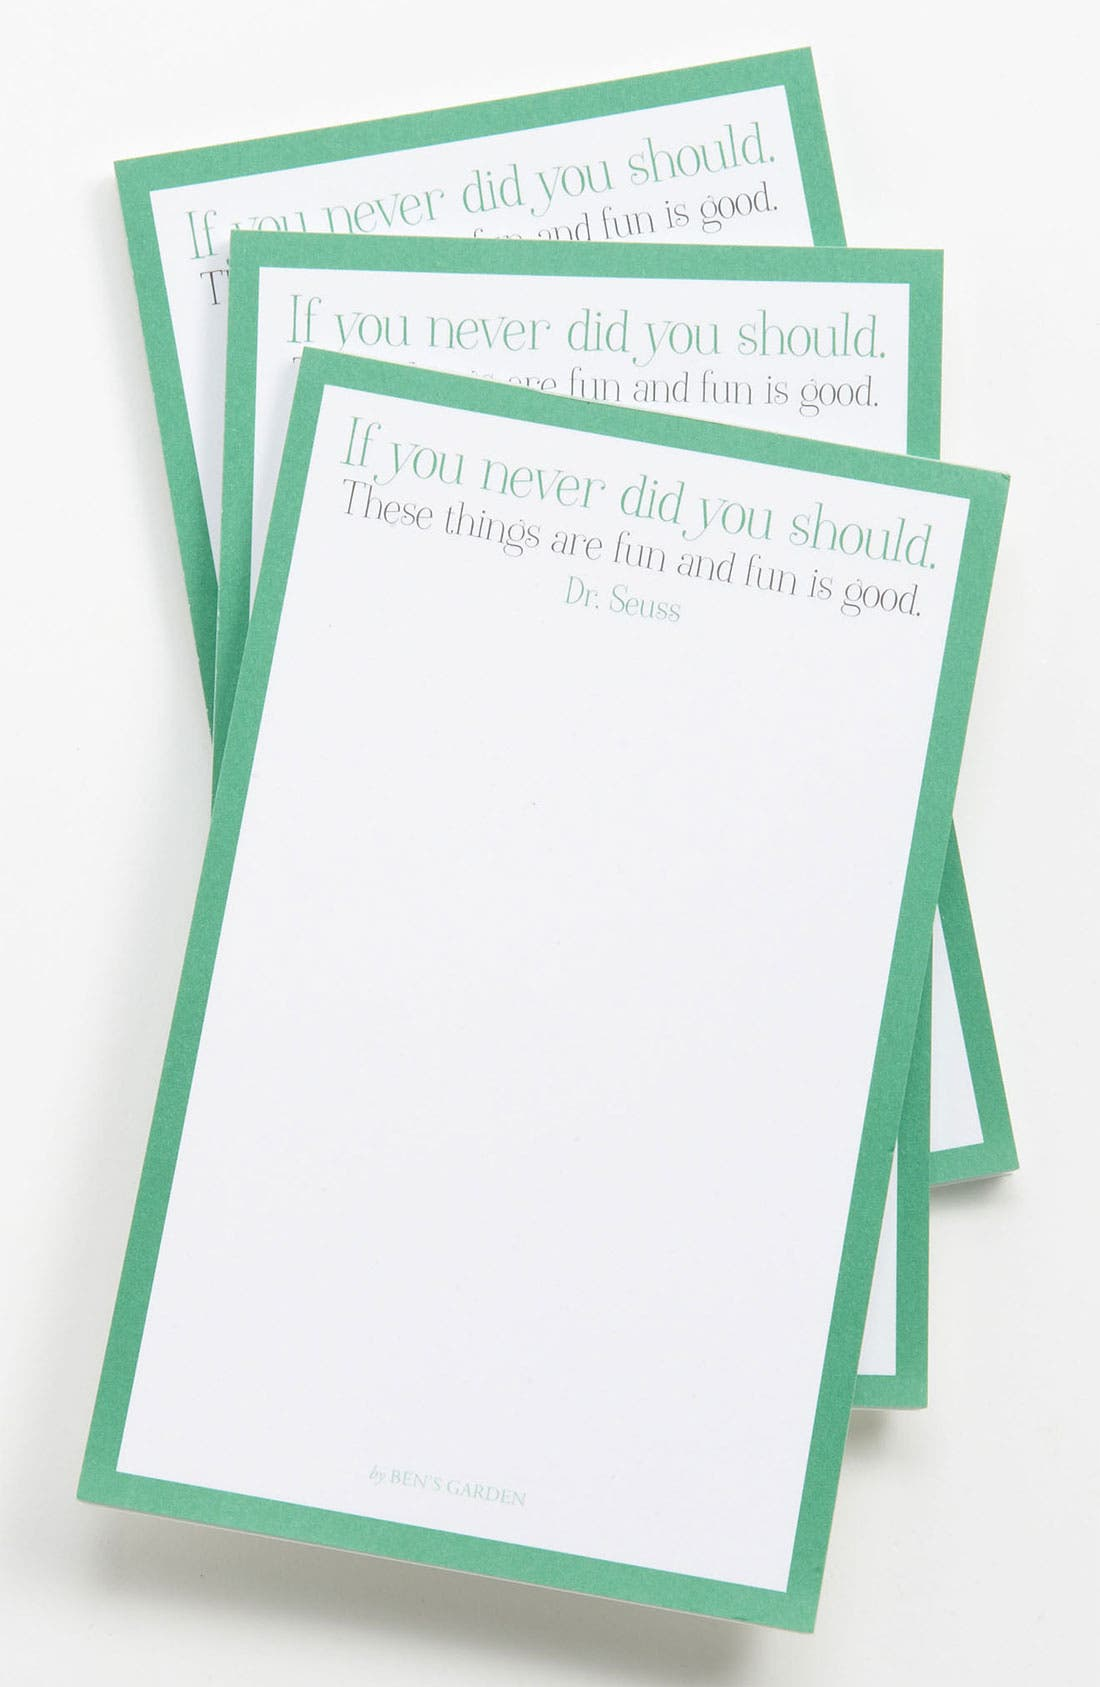 Alternate Image 1 Selected - Ben's Garden 'Fun Is Good' Notepads (3-Pack)